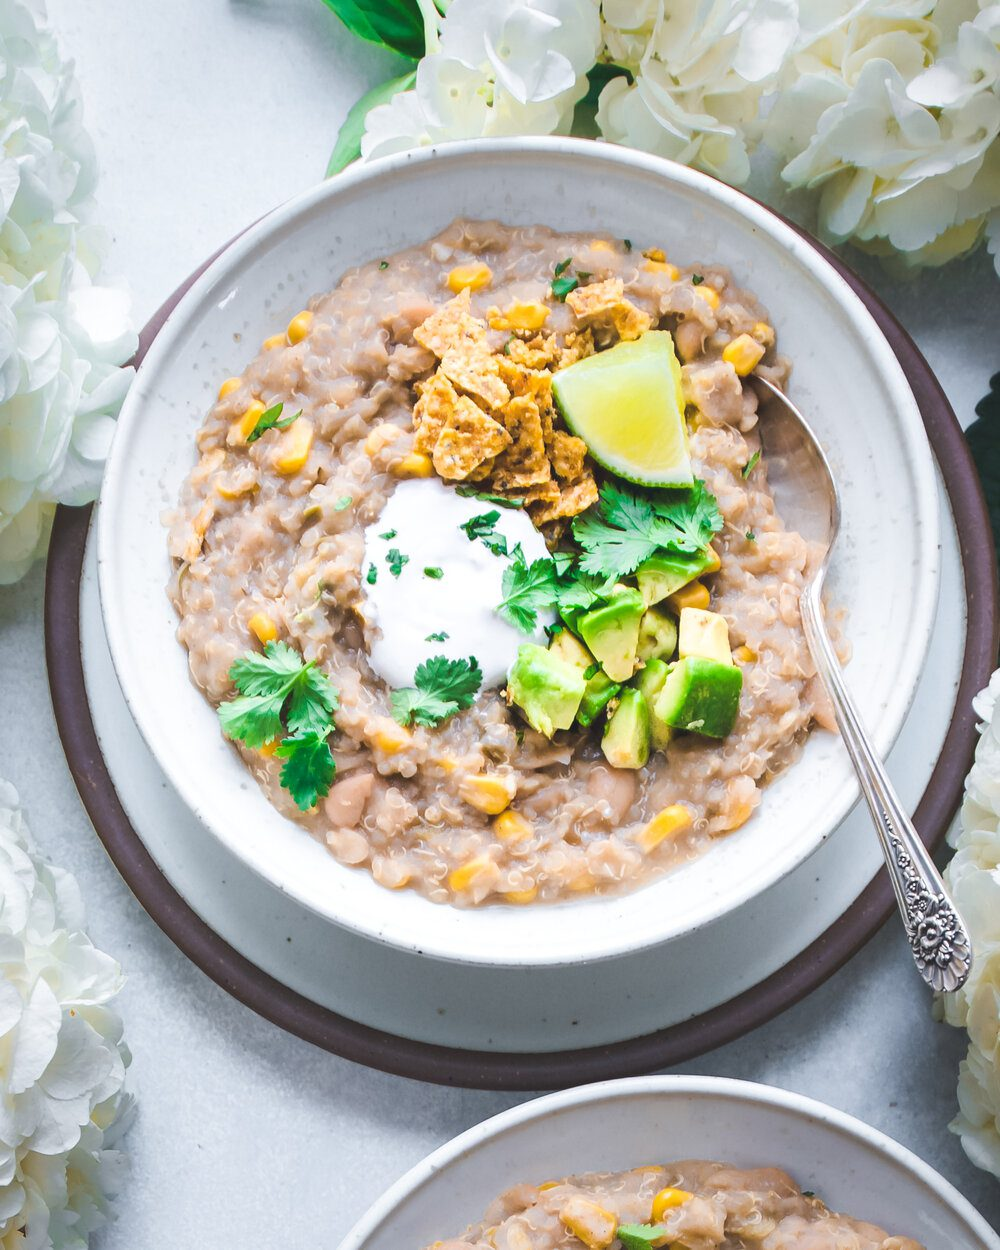 Healthy Vegan Instant Pot Recipes to Make This Winter. Instant Pot White Bean Quinoa Chili.